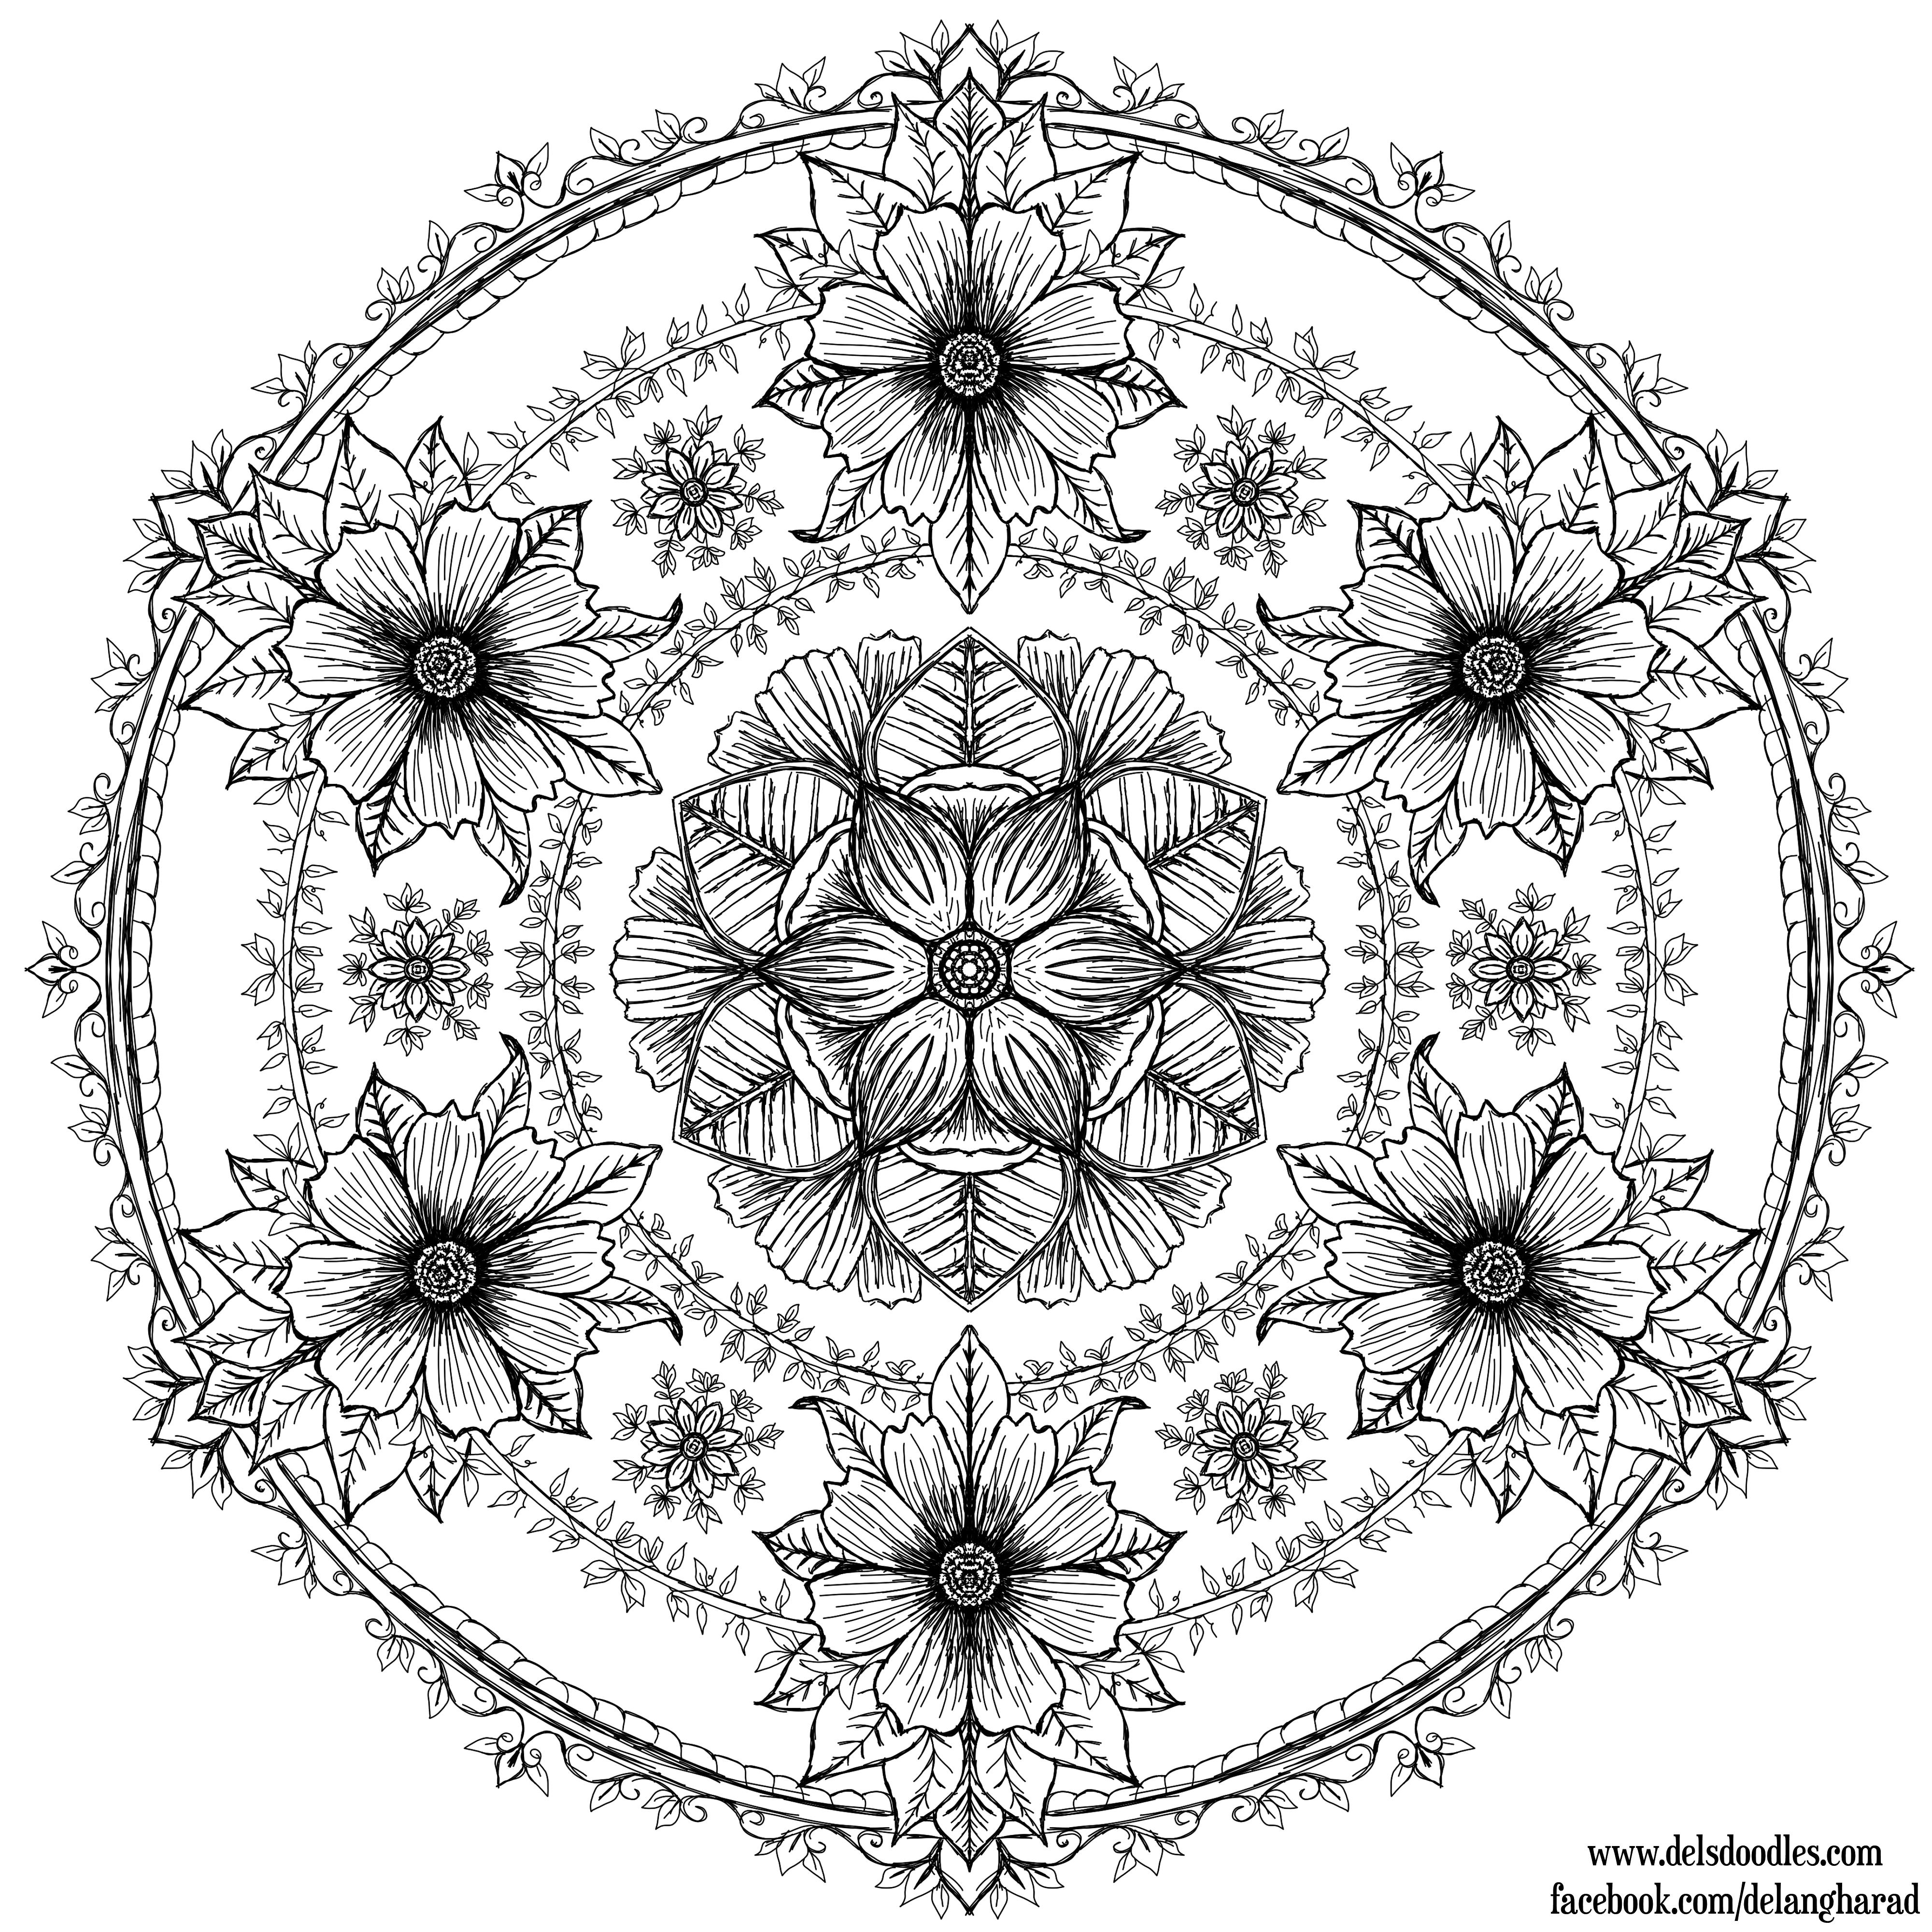 Flowery Circles Mandala By Welshpixie Dai2j20 Png 4000 4000 Mandala Coloring Pages Mandala Mandala Coloring